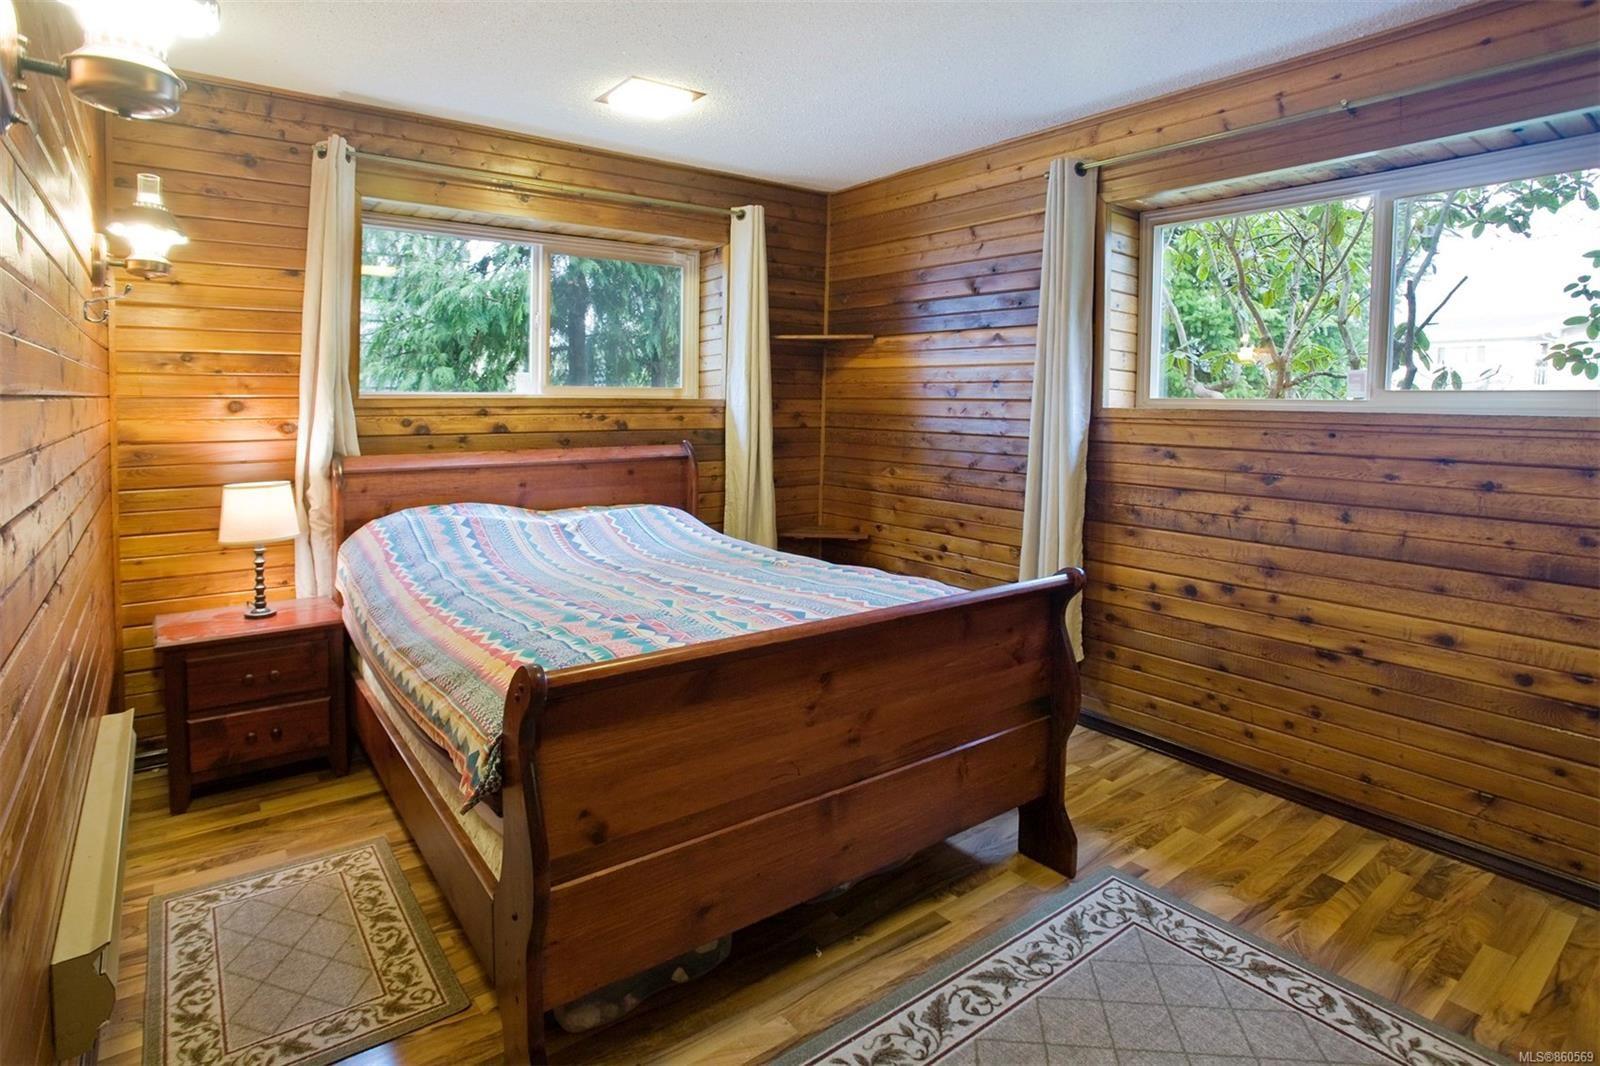 Photo 10: Photos: 4156 Ravenhill Ave in : PA Port Alberni House for sale (Port Alberni)  : MLS®# 860569